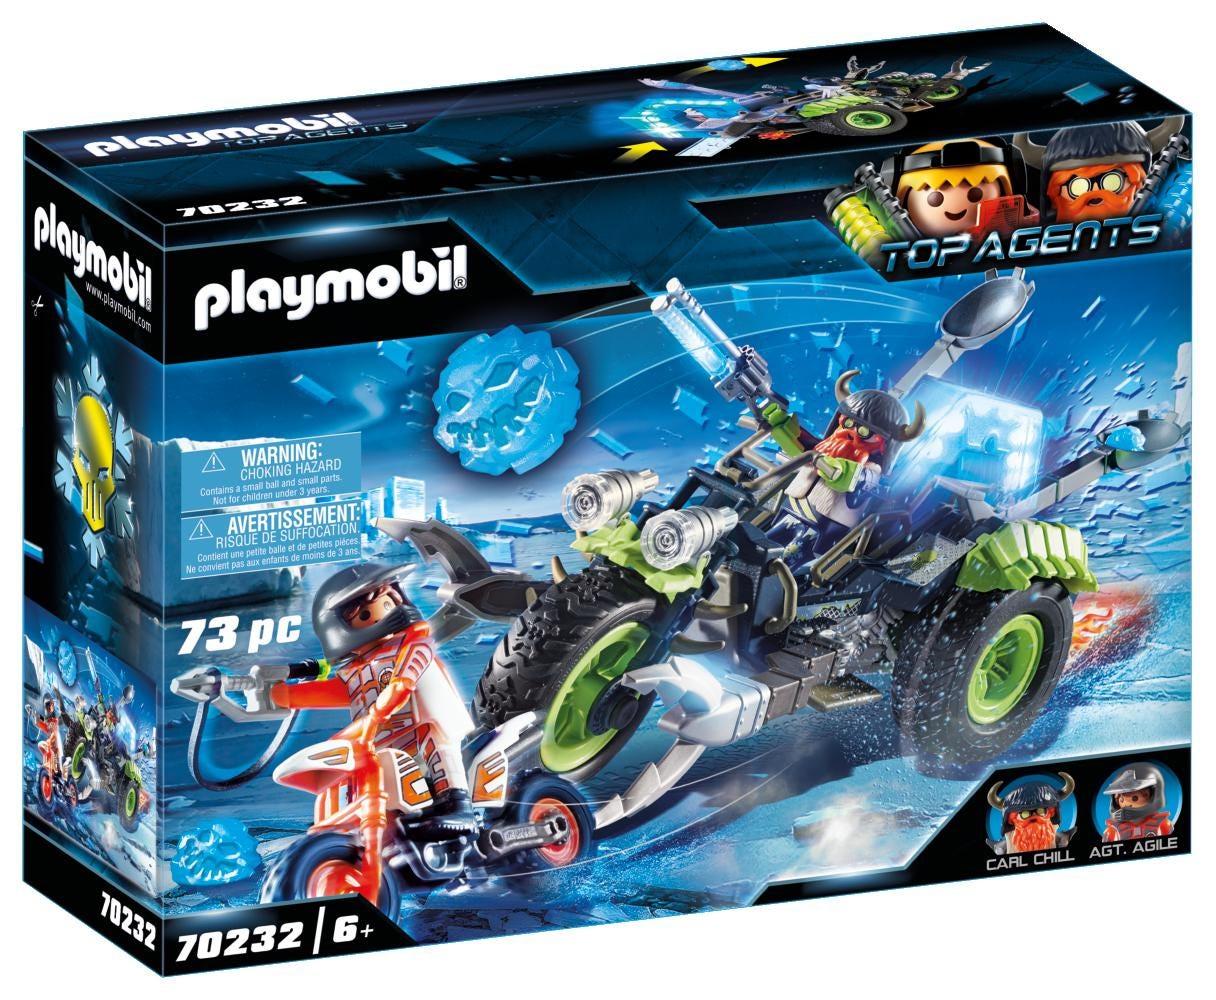 Playmobil 70232 Top Agent